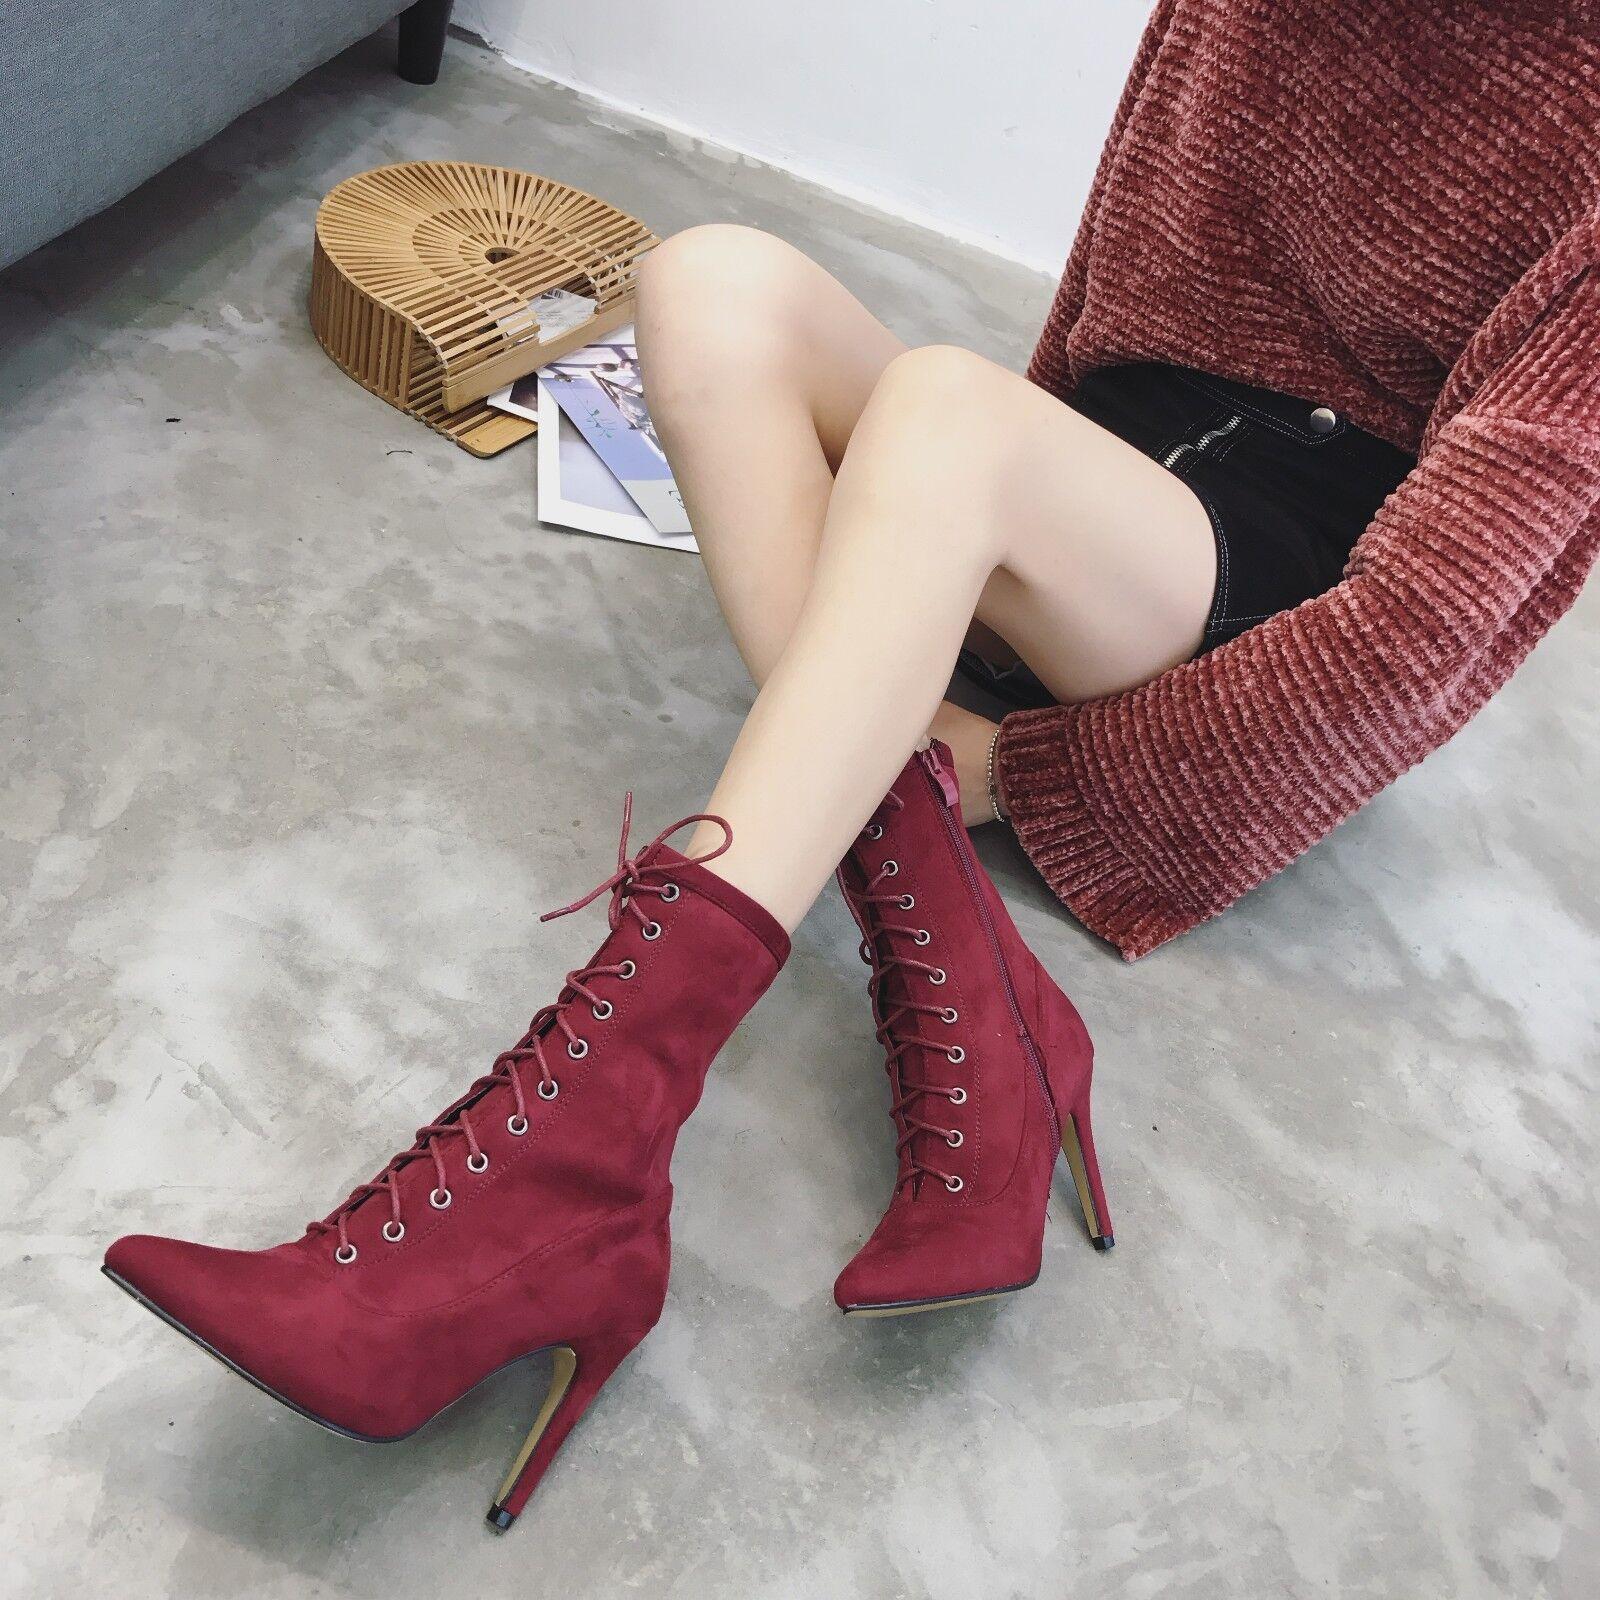 Stivali stivaletti stivaletti Stivali stiletto bassi rosso spillo eleganti 11 cm simil pelle 1392 4416f4